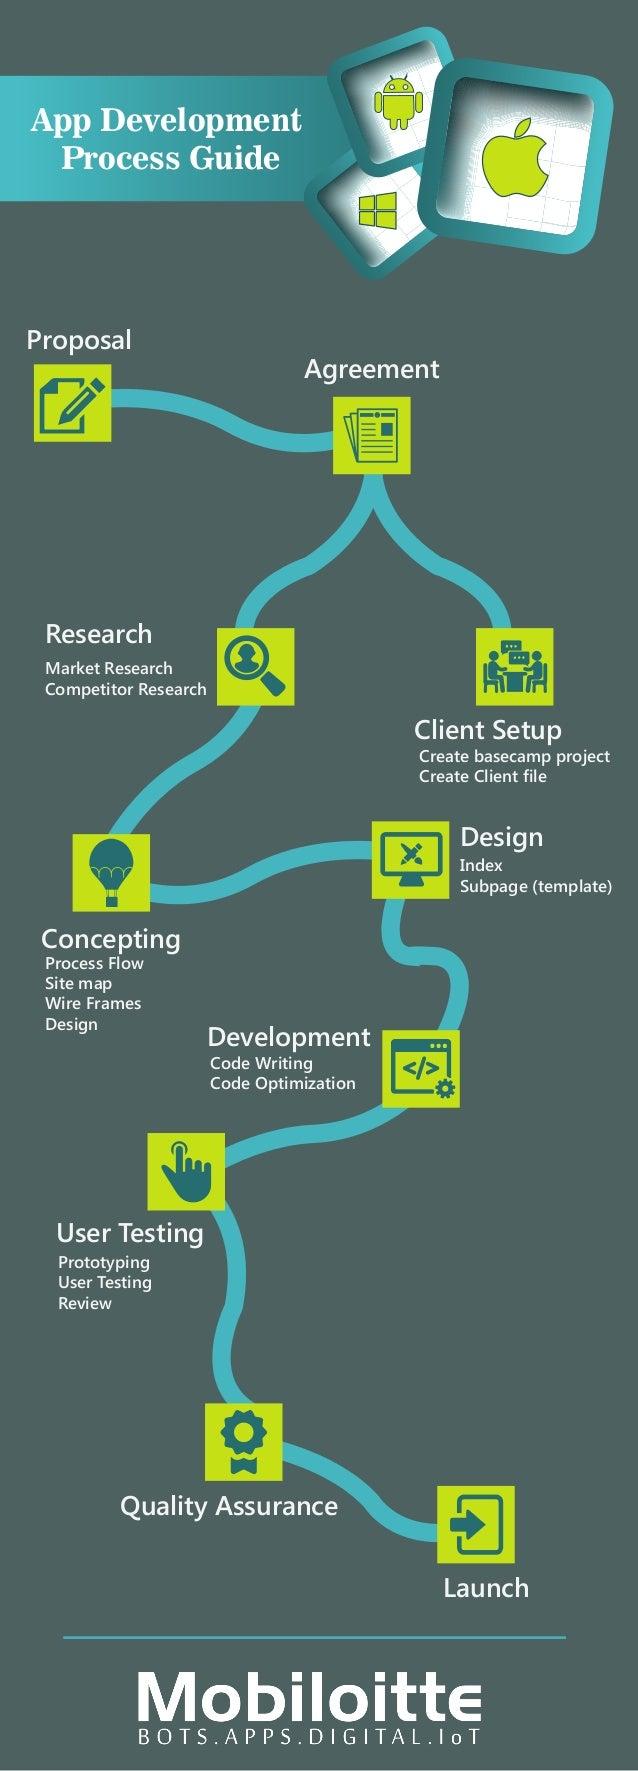 App Development Process Guide